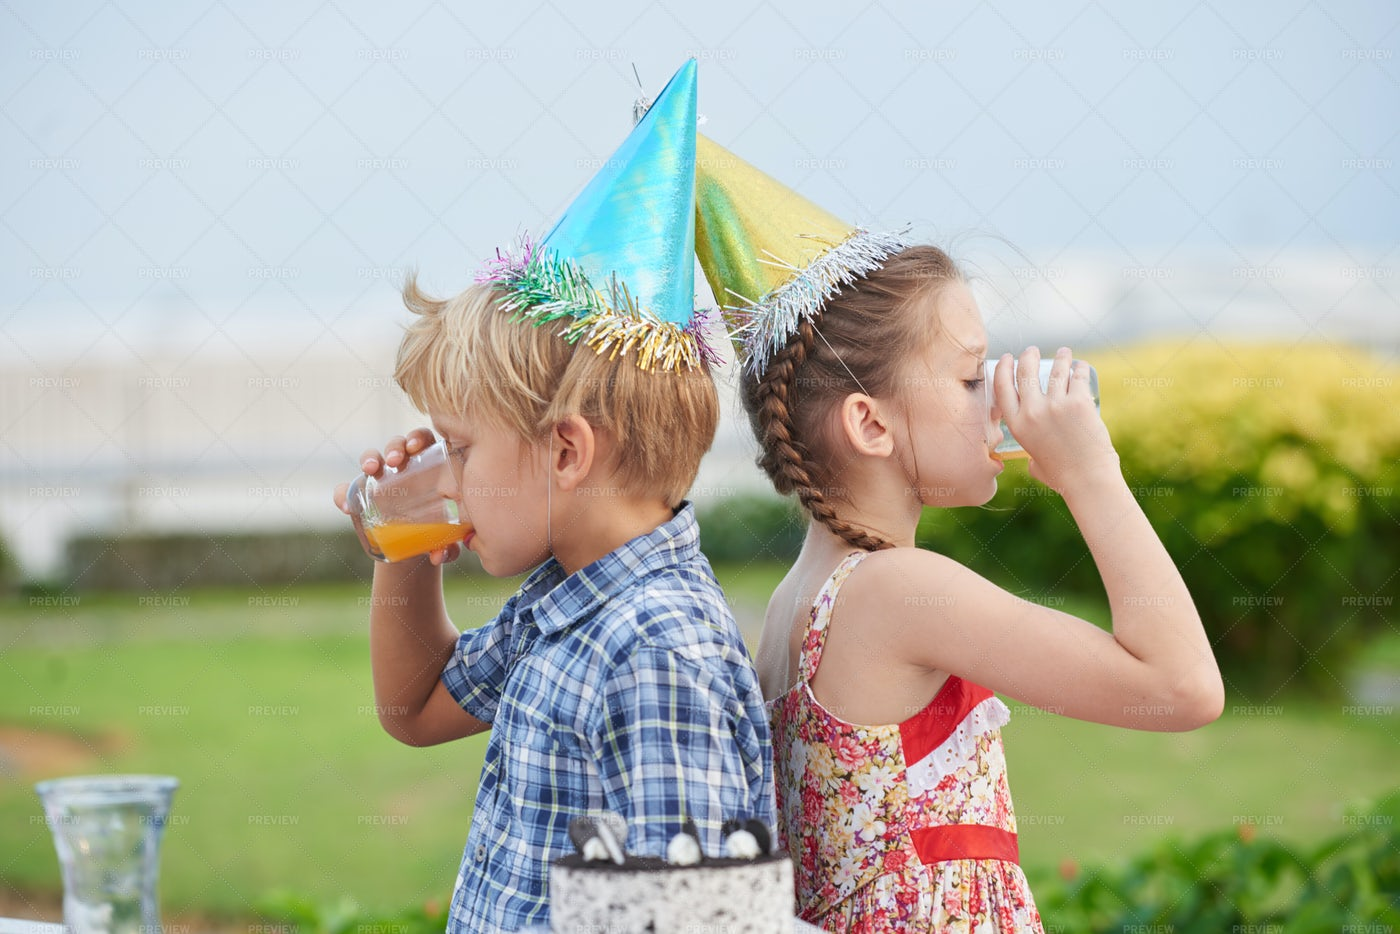 Best Friends At Outdoor Birthday...: Stock Photos